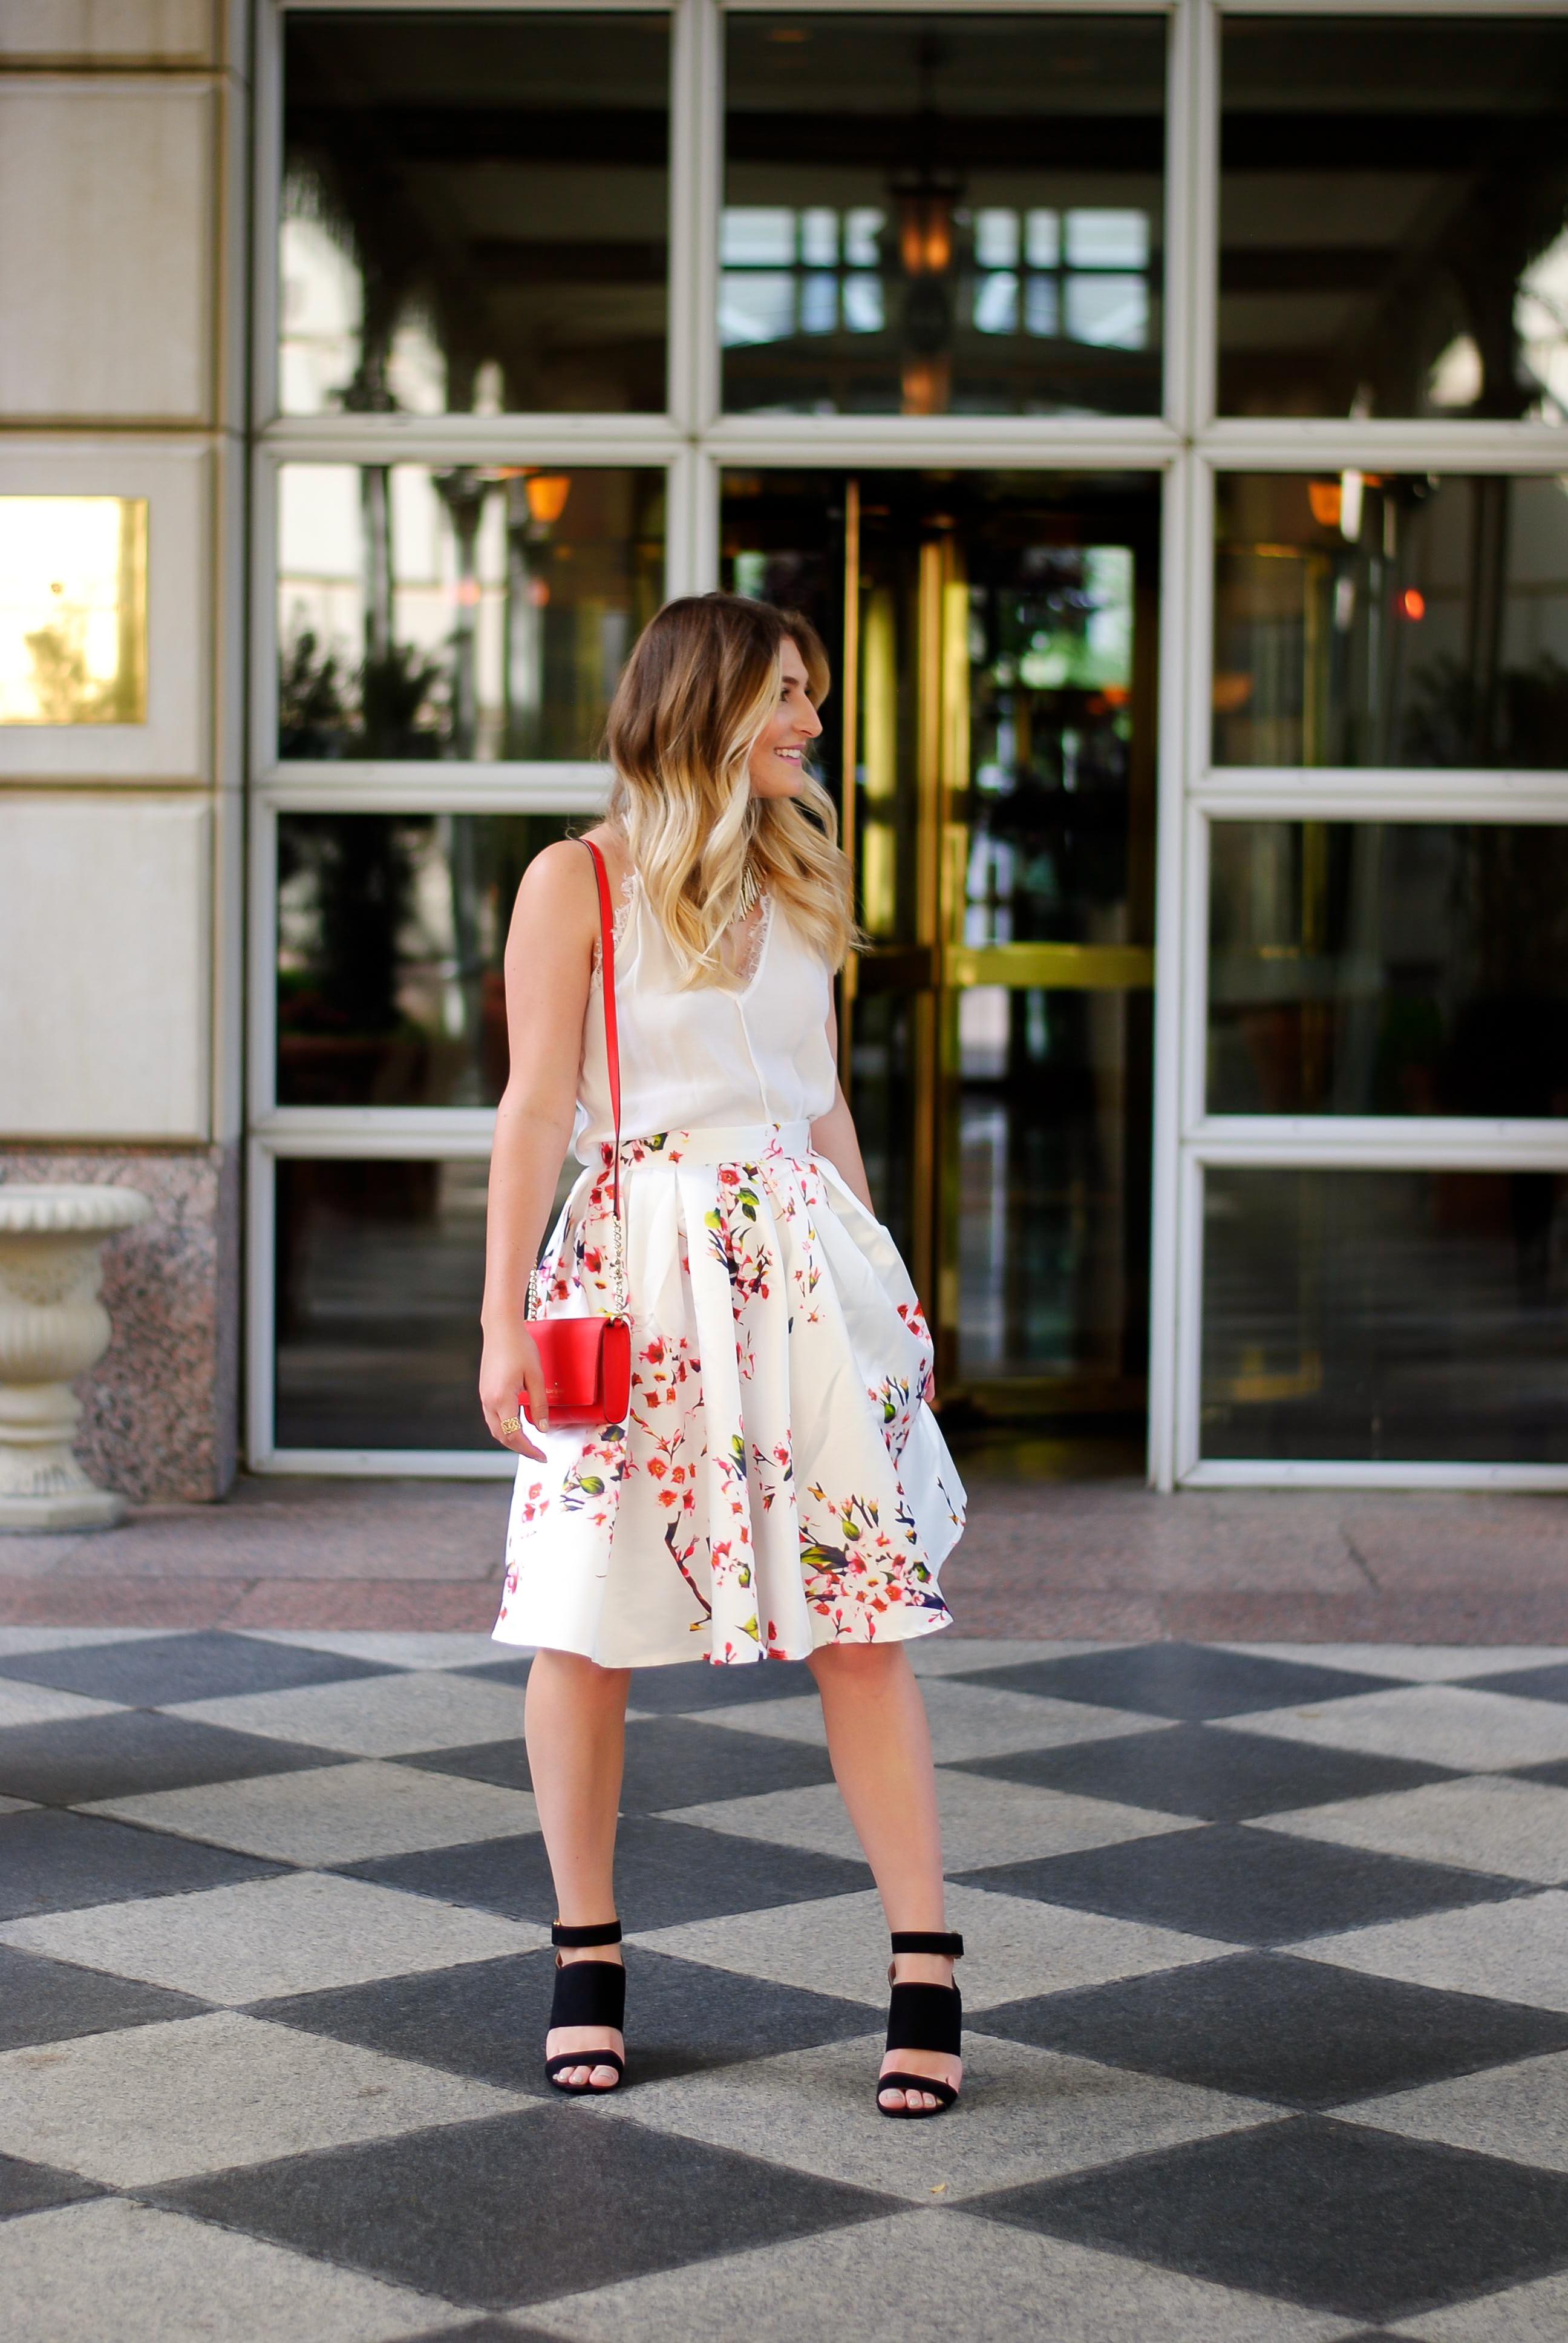 spring/summer floral skirt look | Audrey Madison Stowe Blog